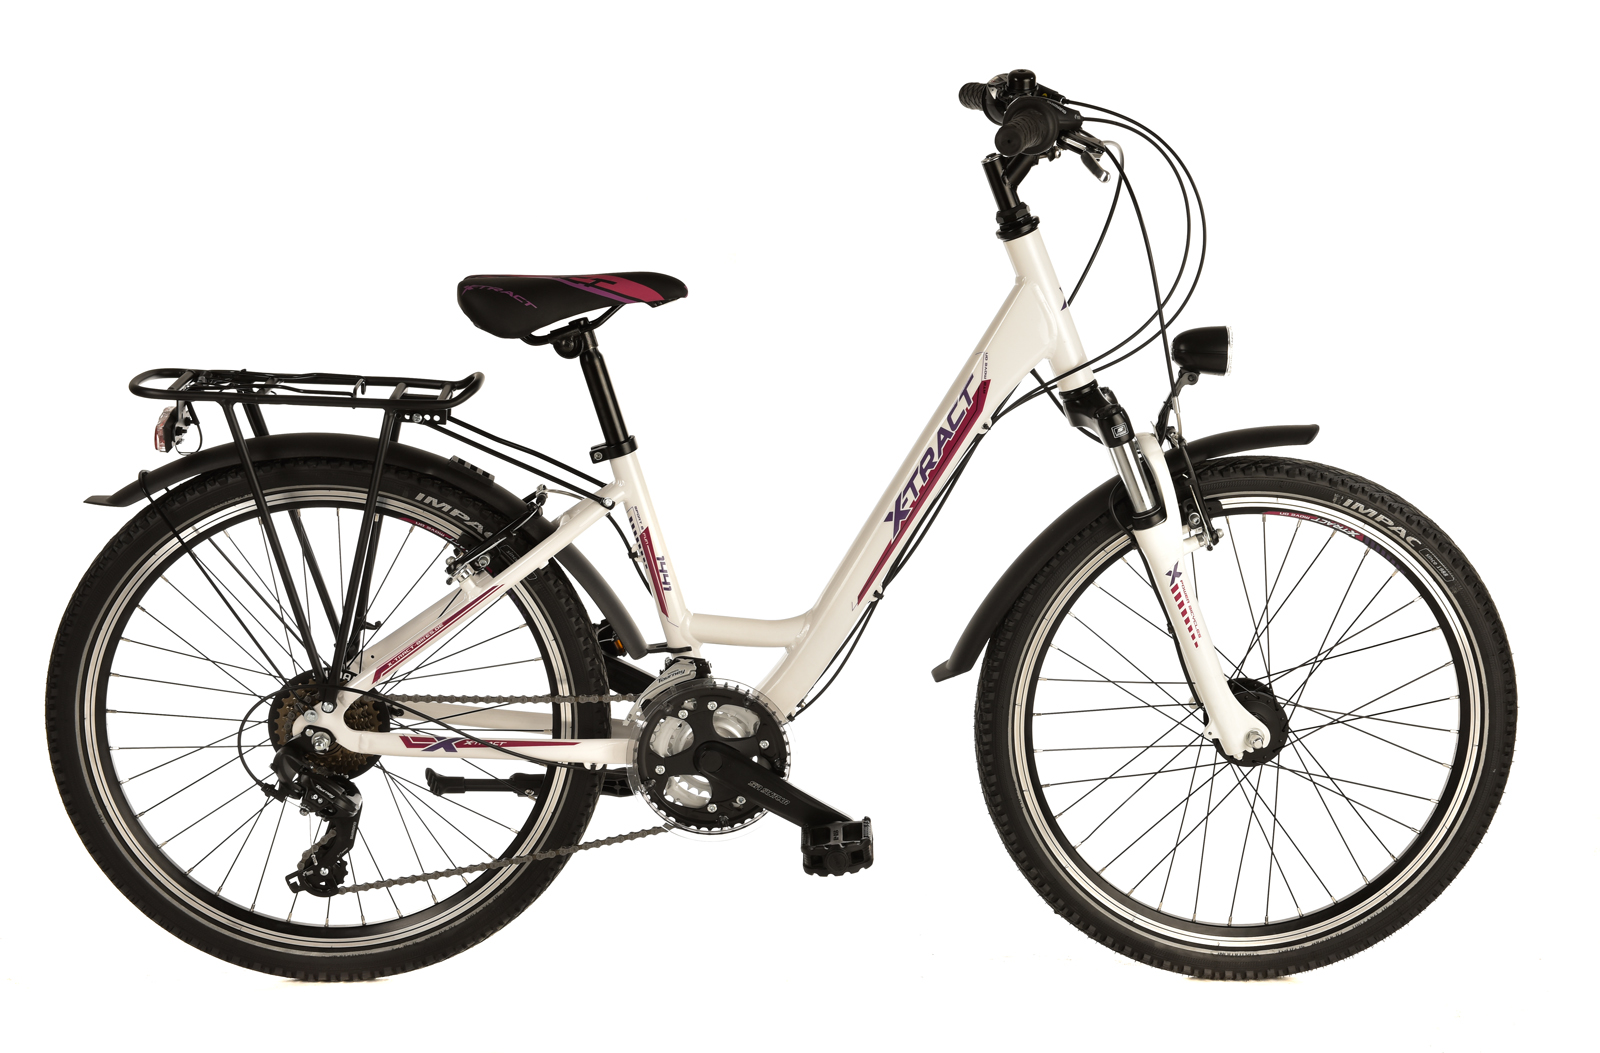 X Tract 1441 Feldmeier Bikes